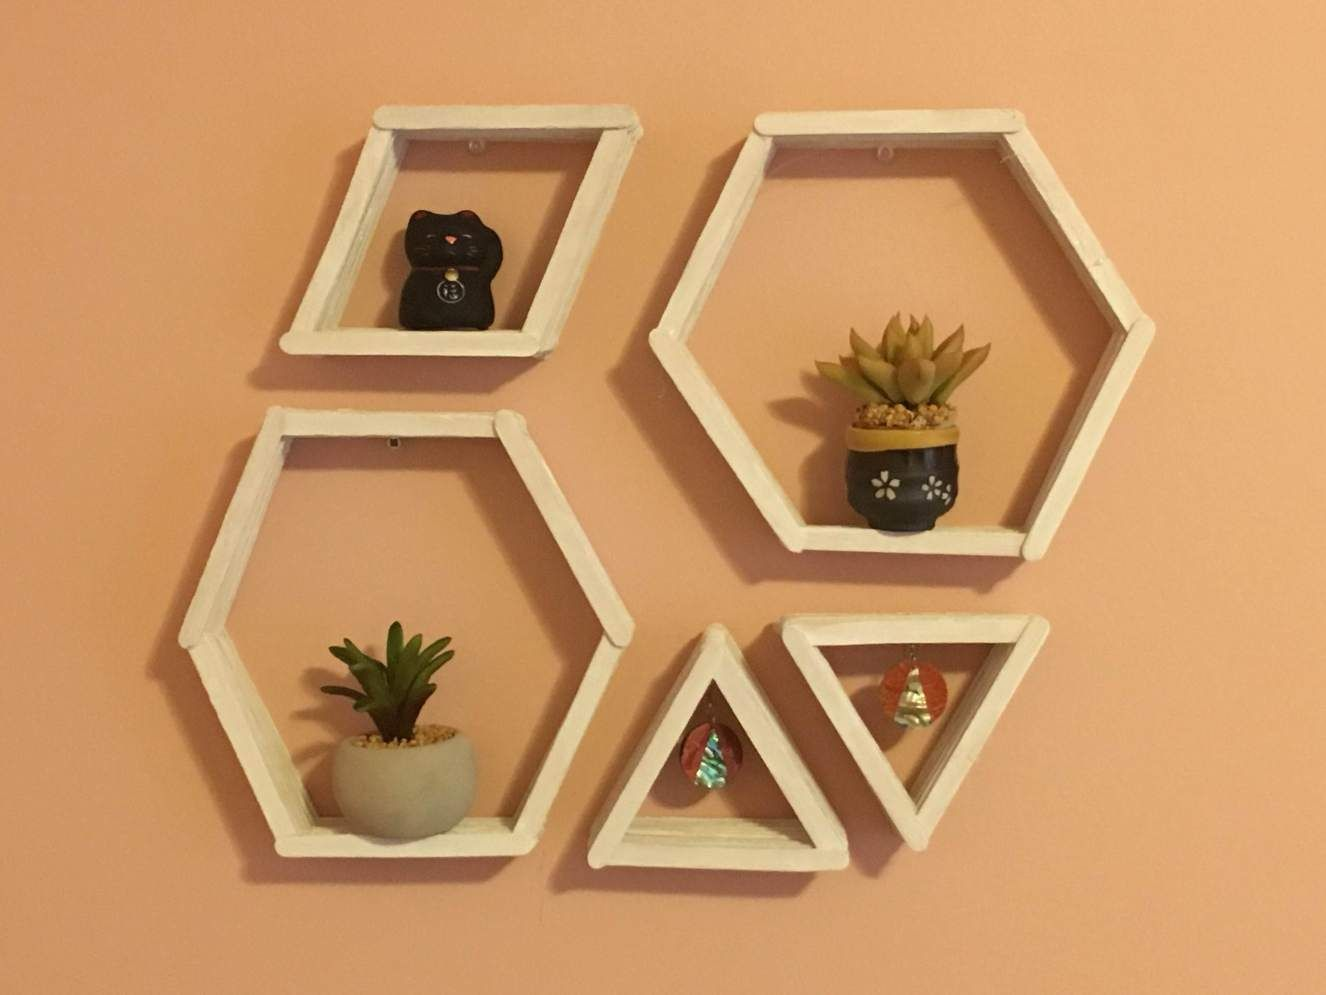 Diy Geometric Wall Shelves Popcycle Stick Crafts Diy Popsicle Stick Crafts Craft Stick Crafts